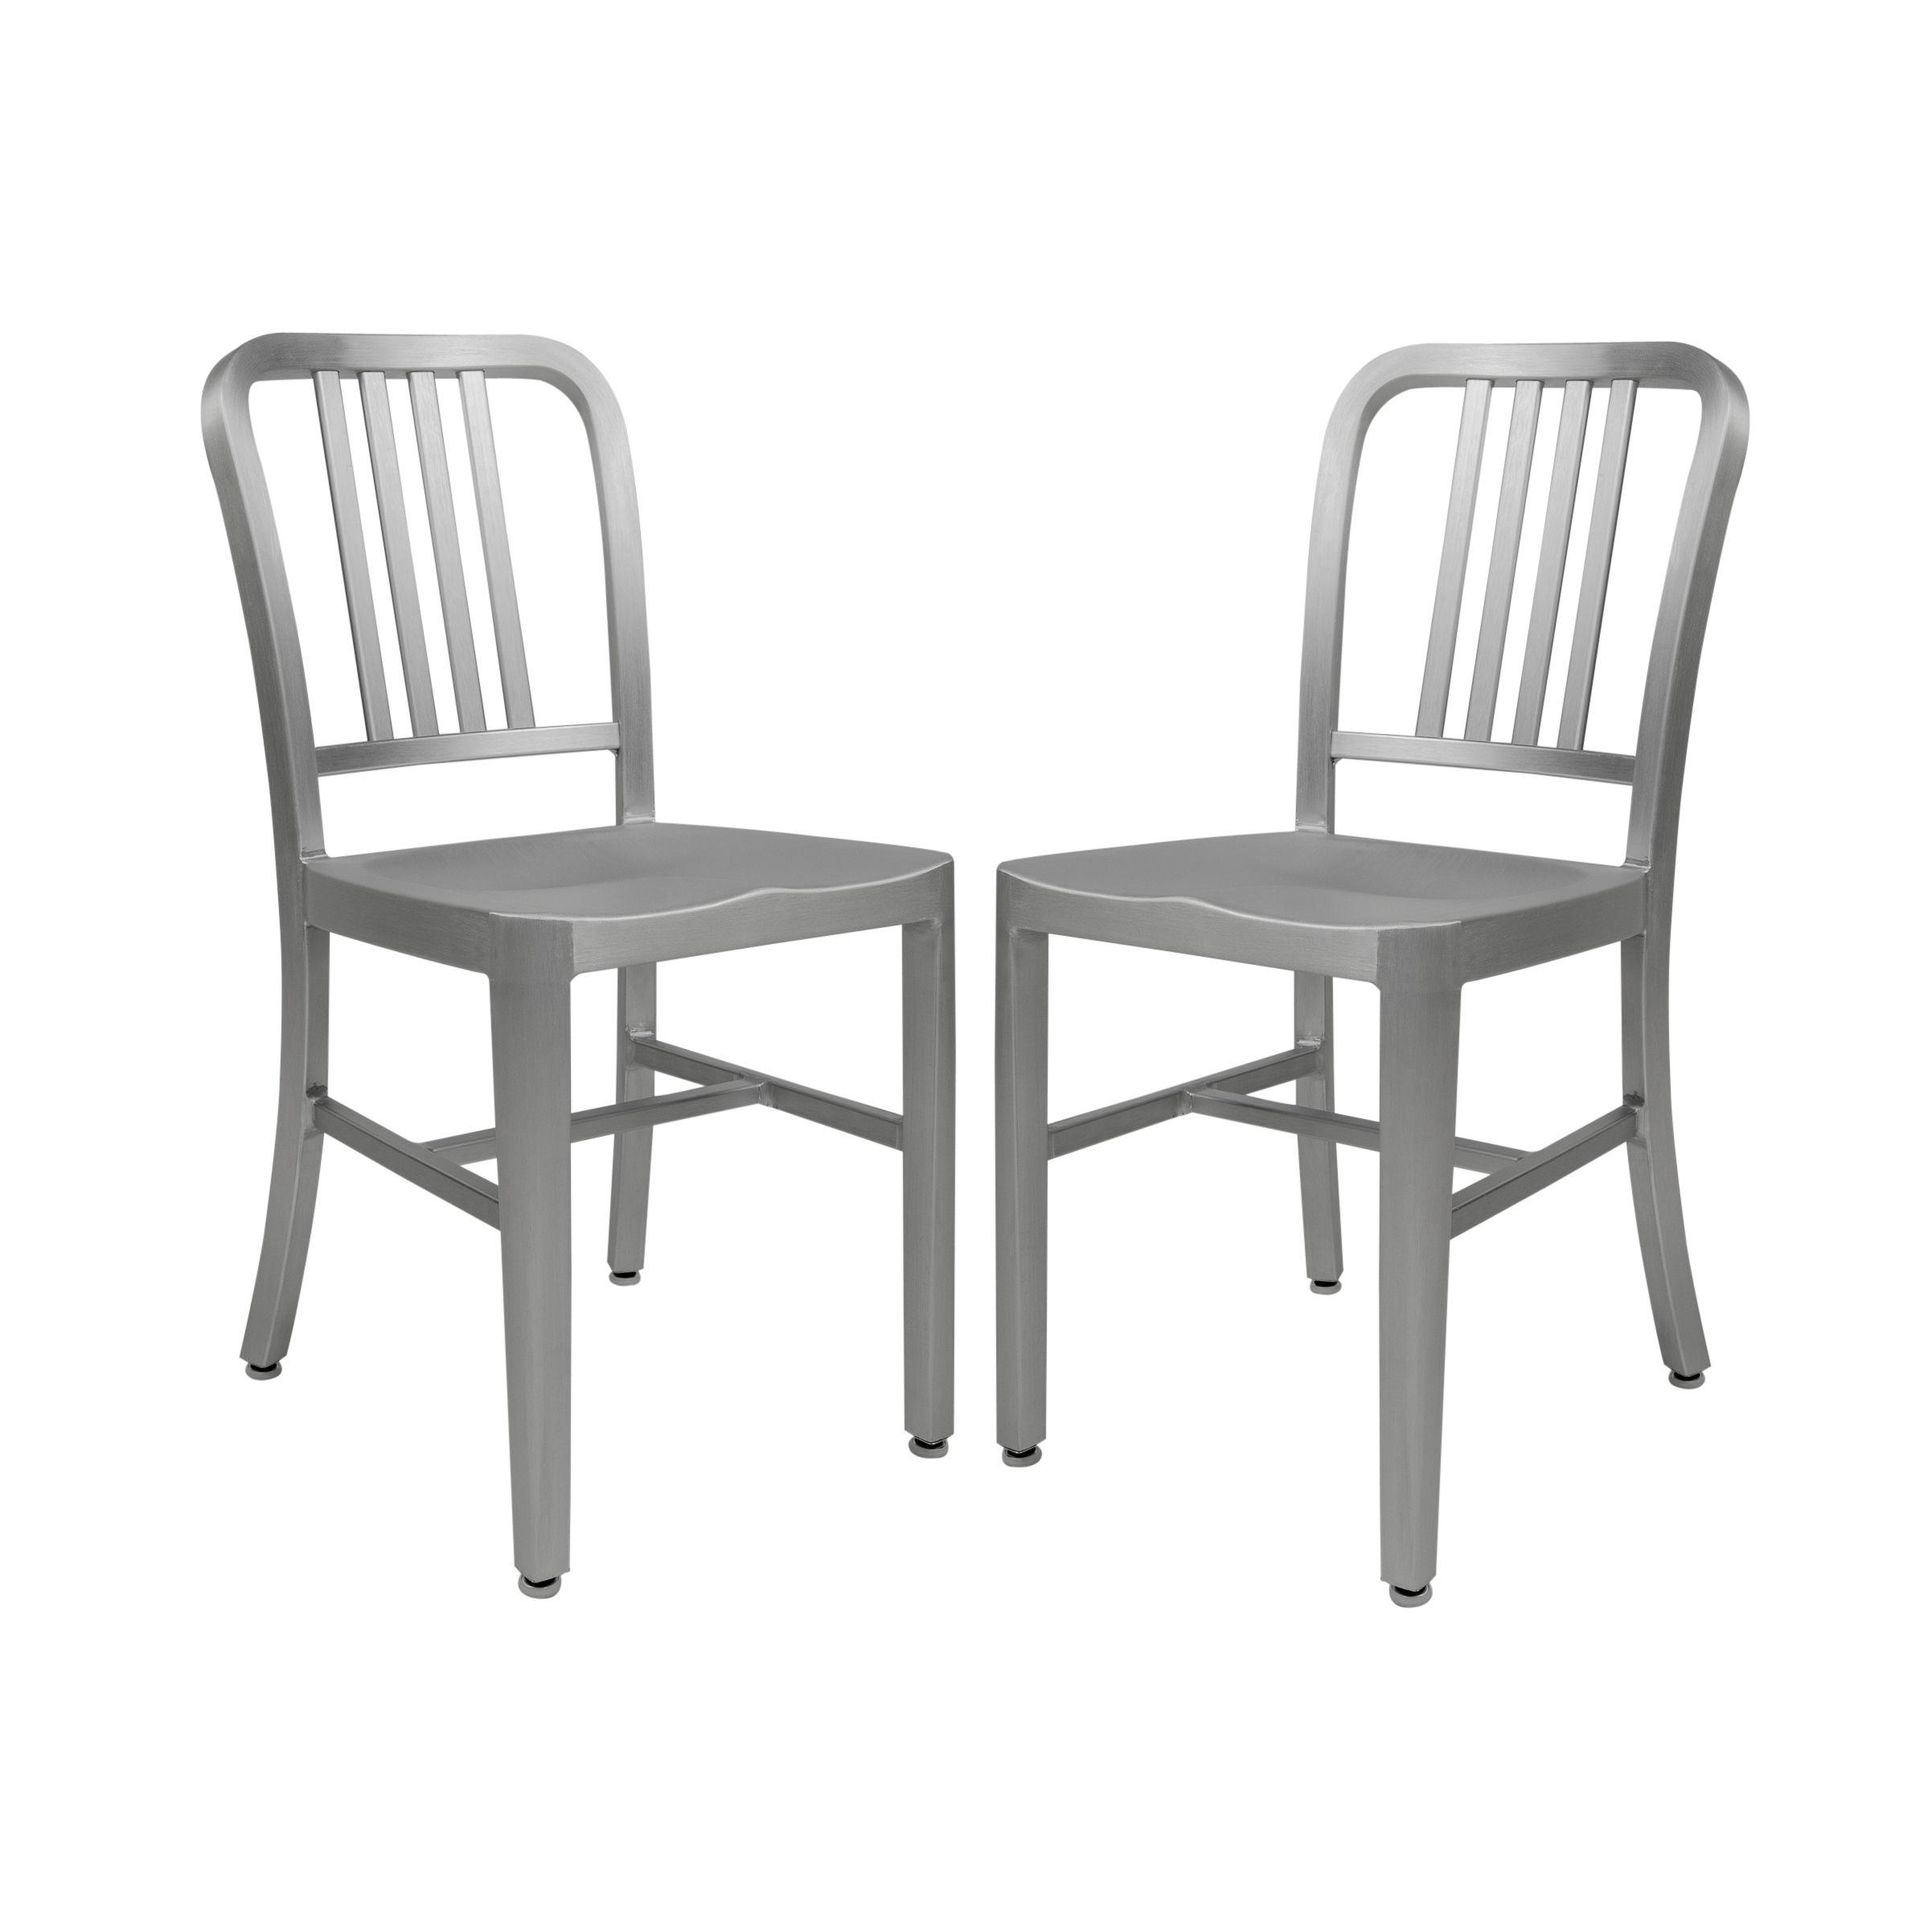 Leisuremod Alton Modern Aluminum Dining Side Chair Set Of 2